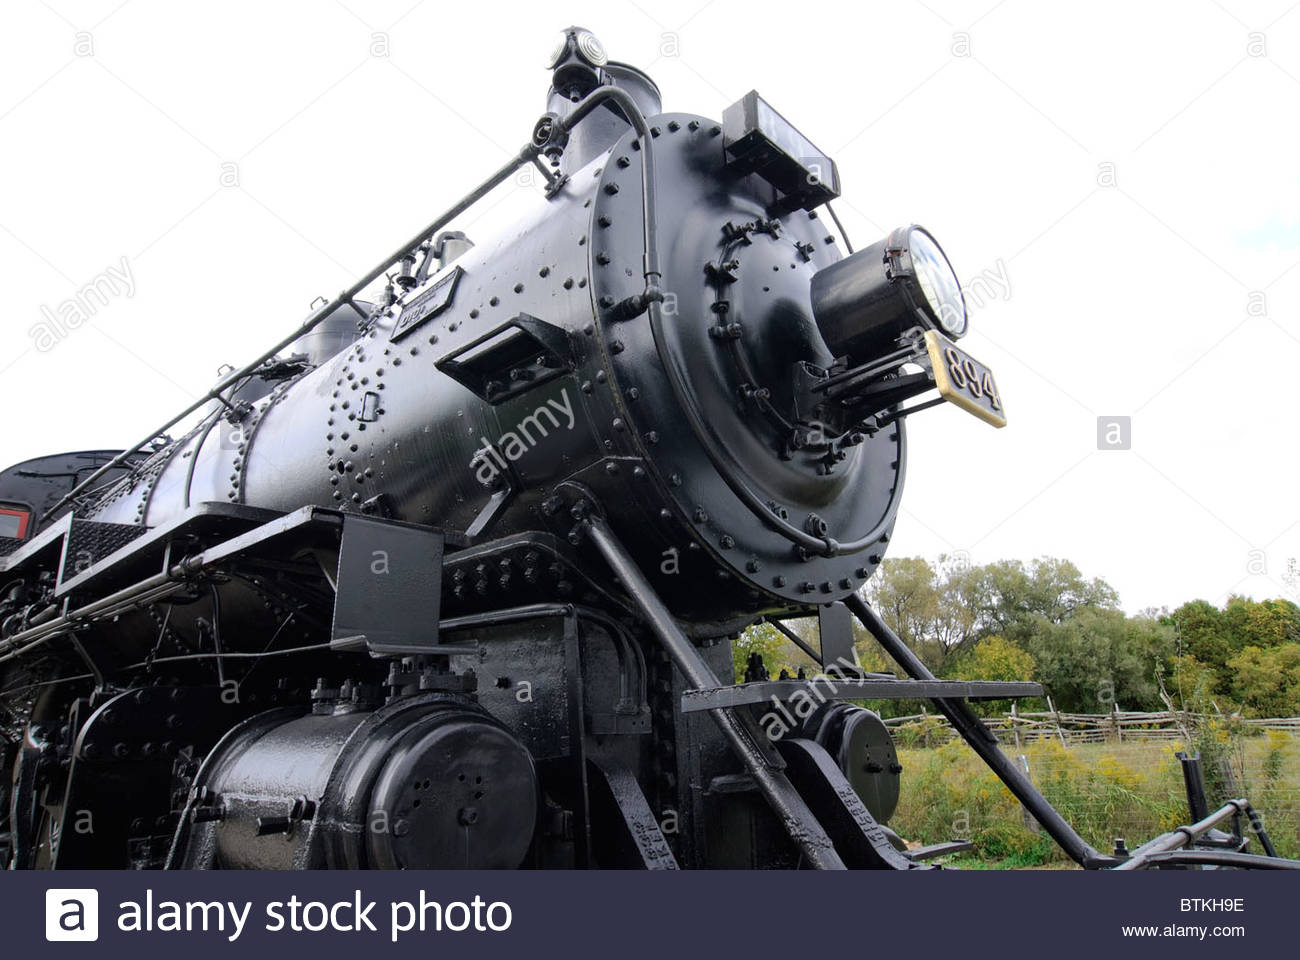 massive refurbished Canadian Railway steam locomotive on display in railroad museum Stock Photo